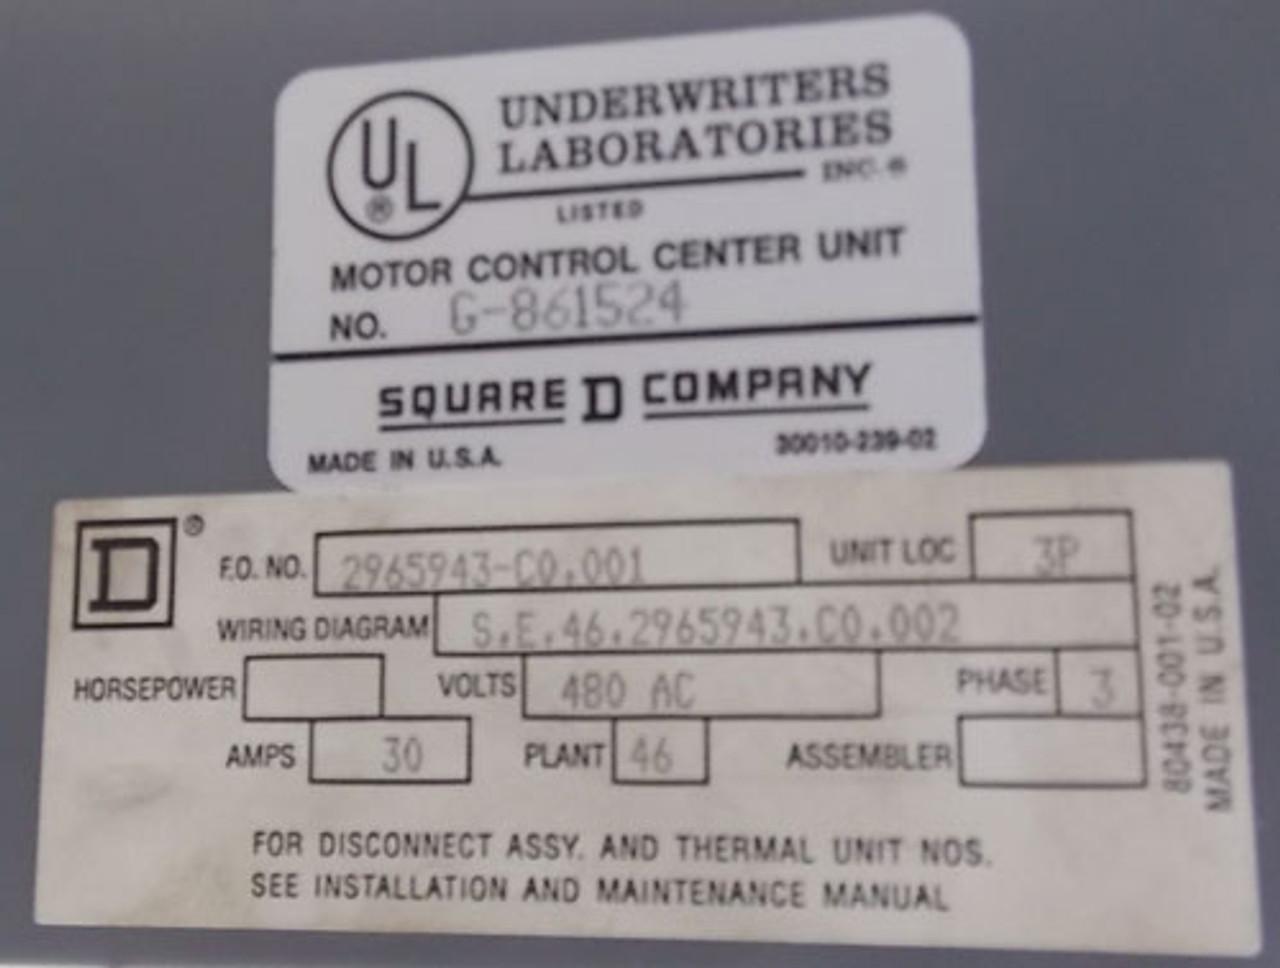 Square D Model 5 Motor Control Center Feeder Bucket 30A 480V 3PH - Used